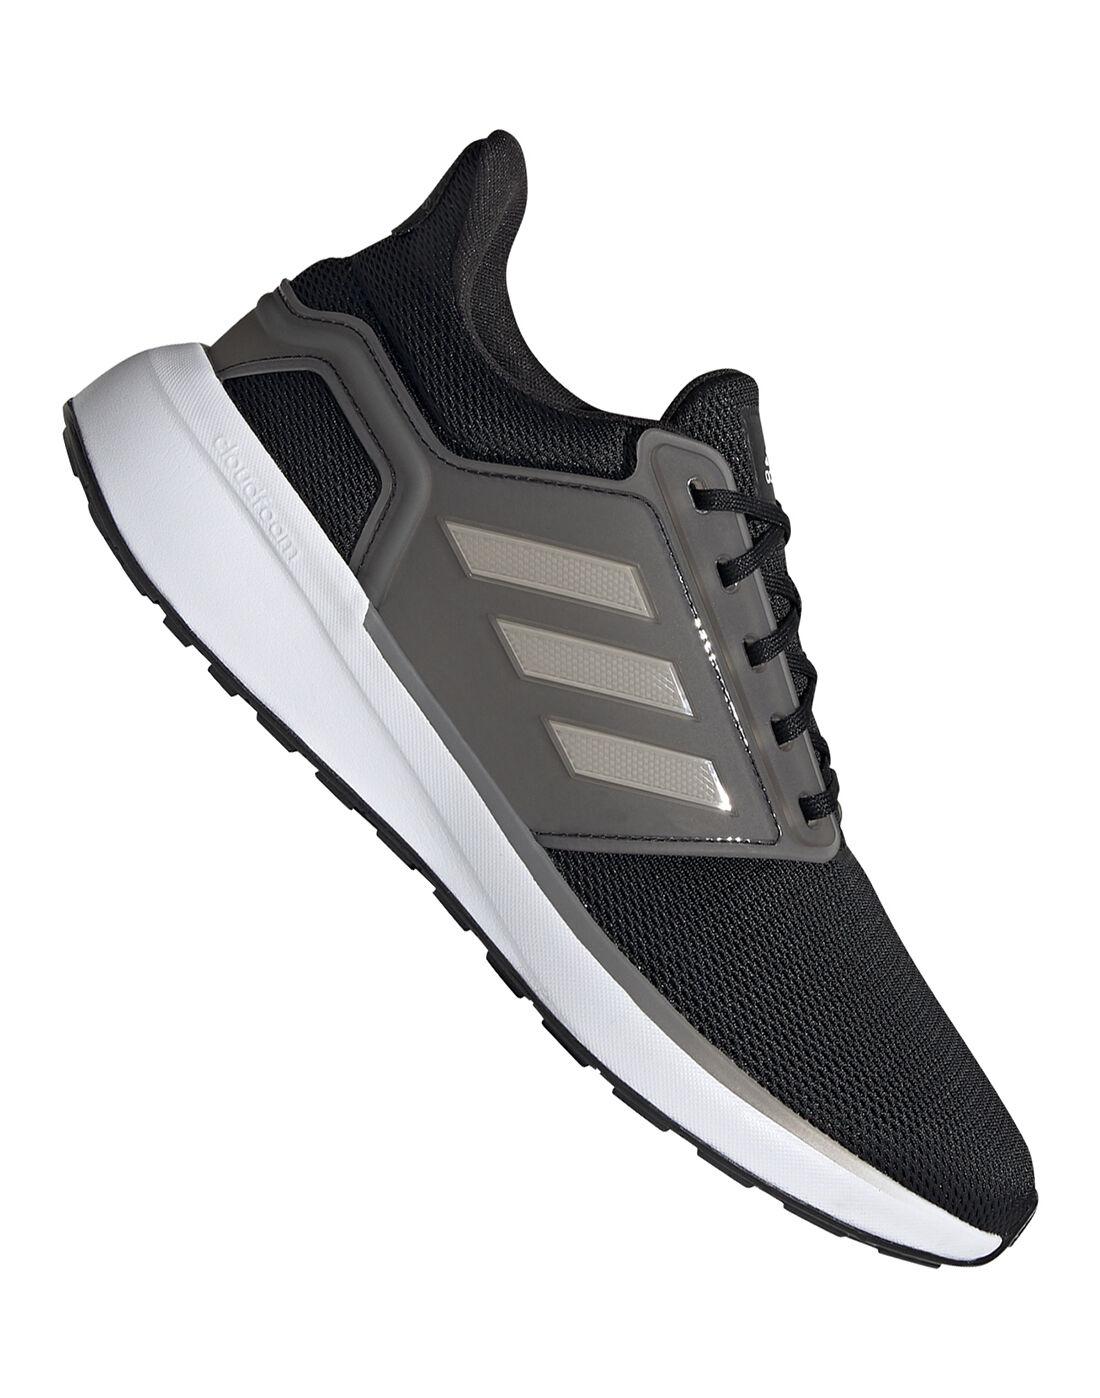 adidas boys nike air vapormax flyknit 2018 men shoes | Mens EQ19 Run